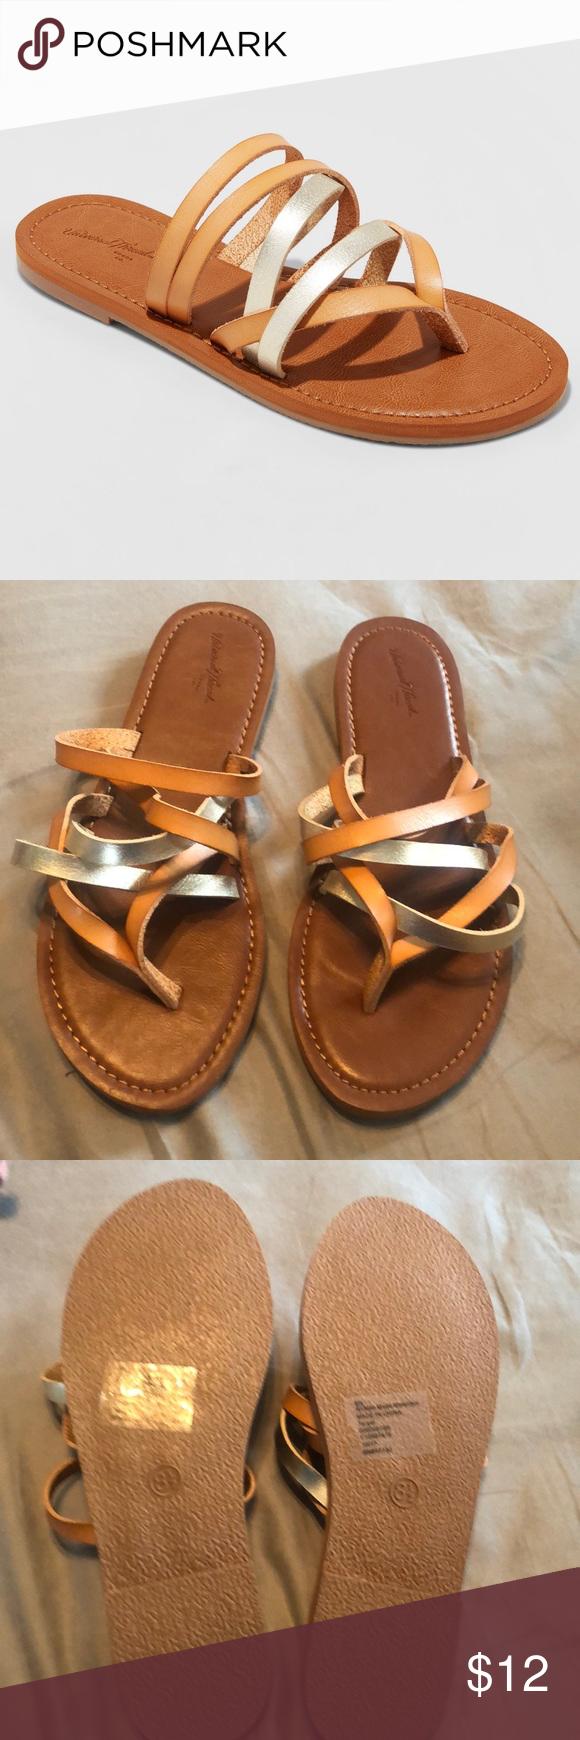 0d159ecd8ca6 Women s Maritza Multi Strap Toe Slide Sandal Target Women s Maritza Multi  Strap Toe Slide Sandal -